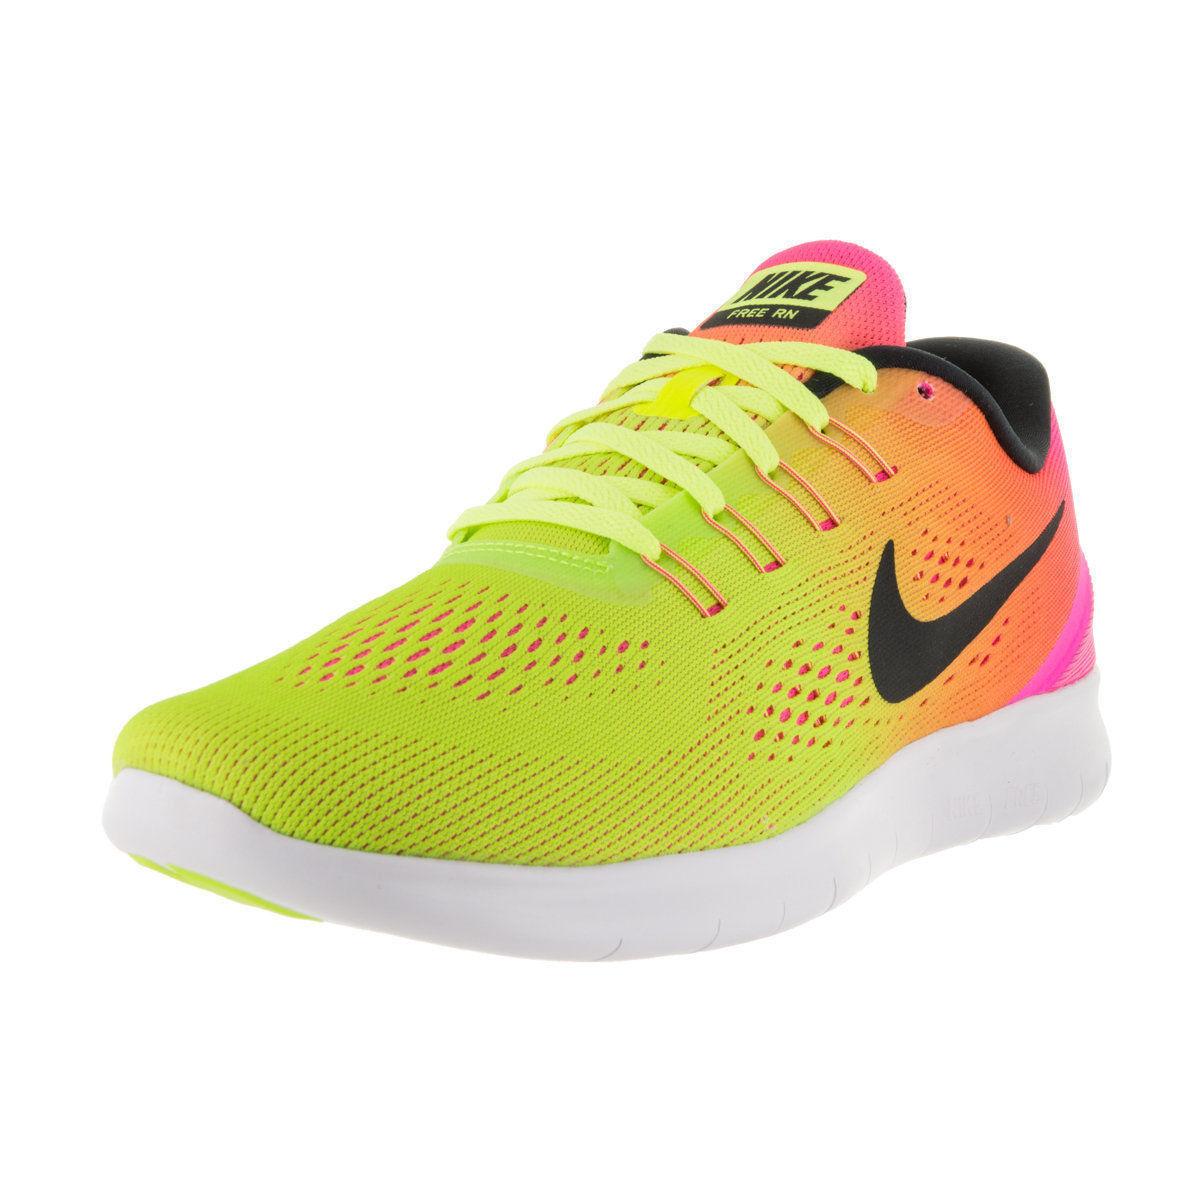 New Men Nike Free RN CO Shoes 844629 999 Size 11.